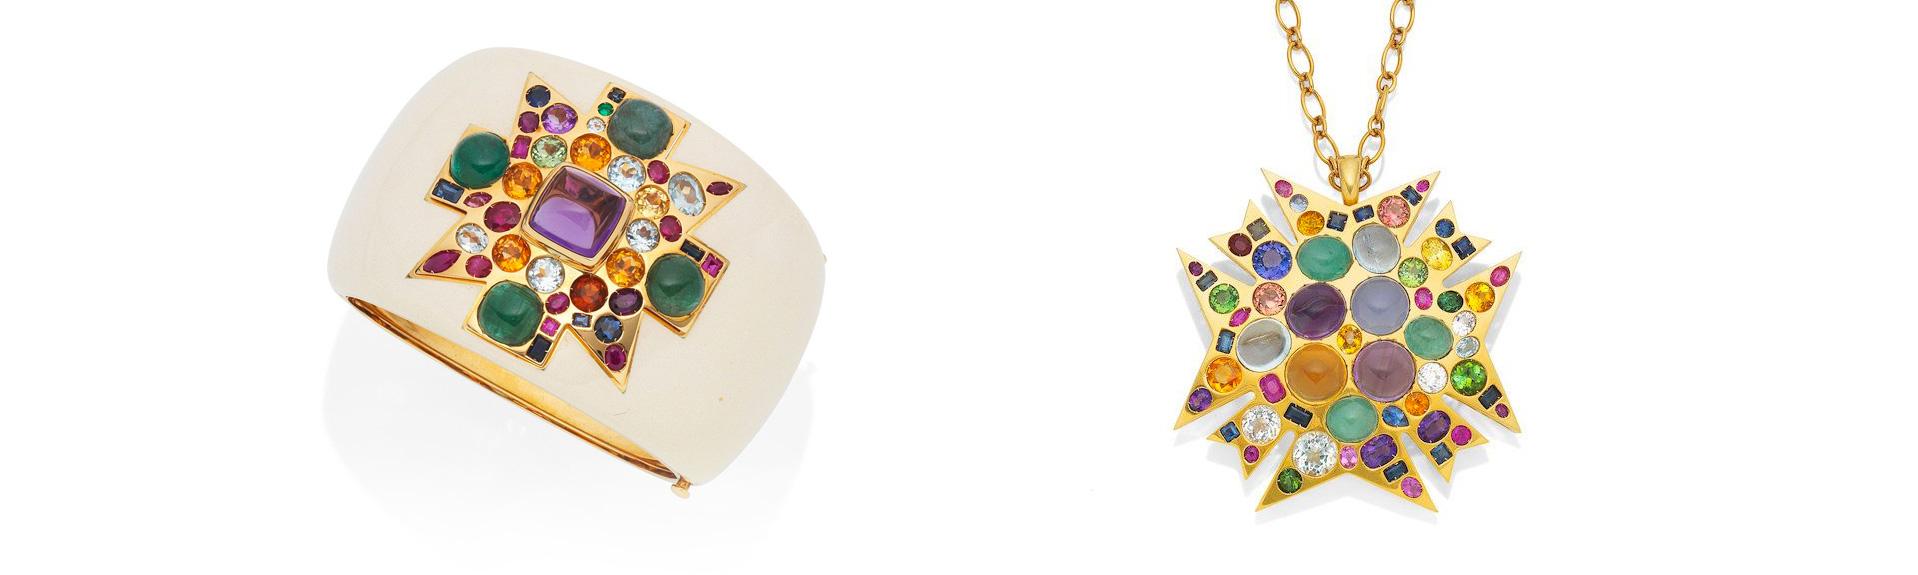 A White Enamel and Gem Set Cuff Bangle and a multi gem set cross pendant/Necklace by Verdura